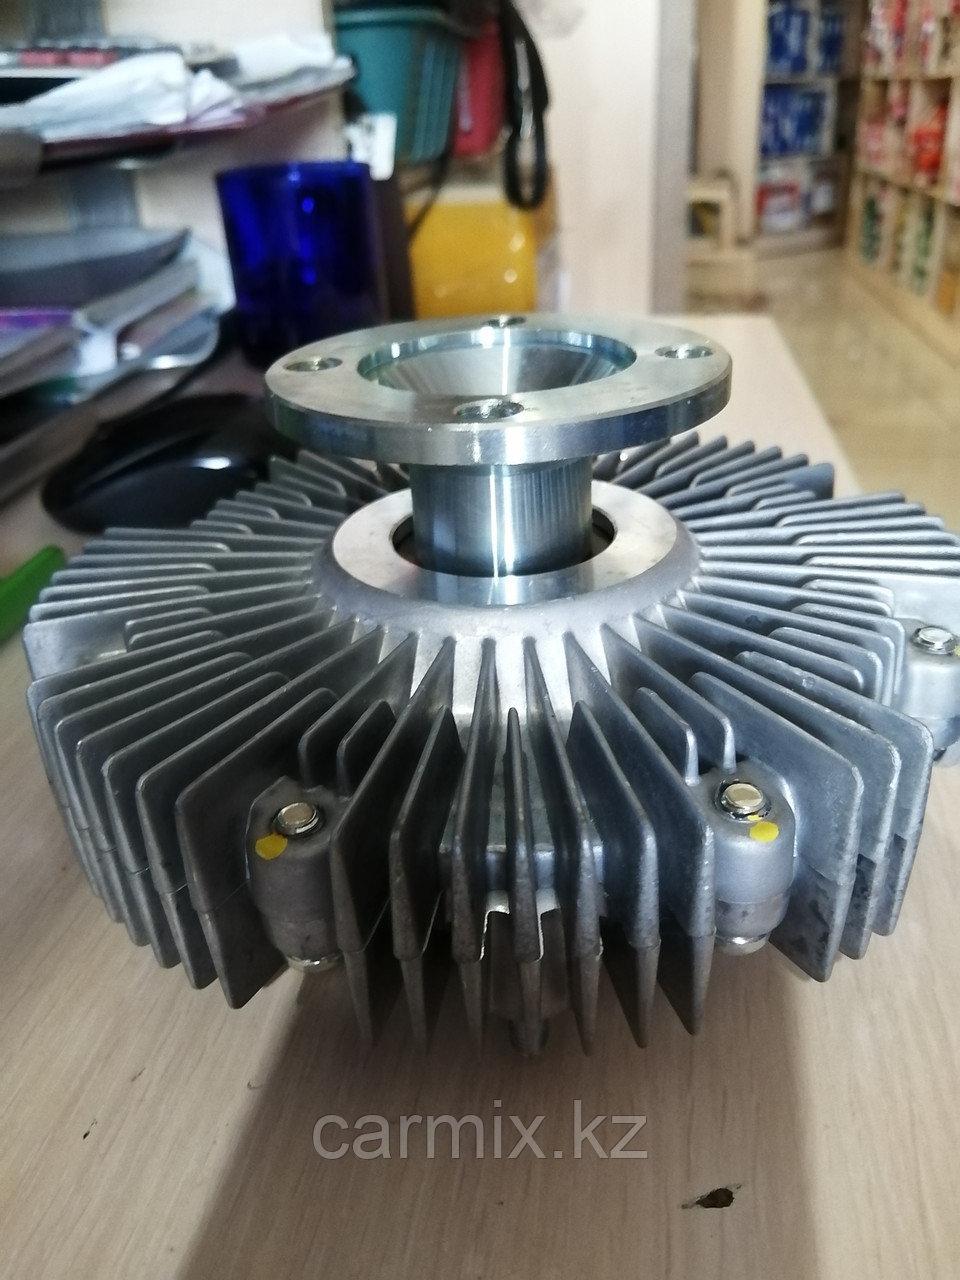 Гидромуфта (термомуфта) вентилятора LAND CRUISER 100, LX450 1FZ V-4500